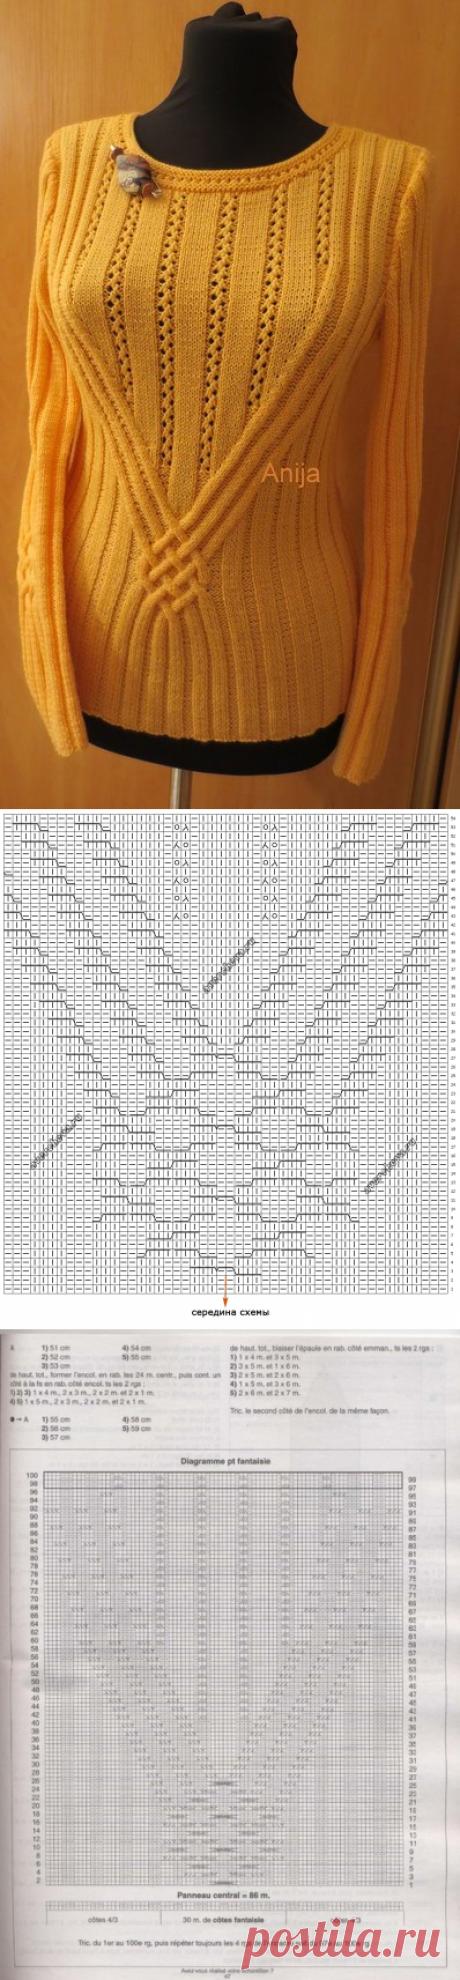 узор 436 мотив с аранами| каталог вязаных спицами узоров